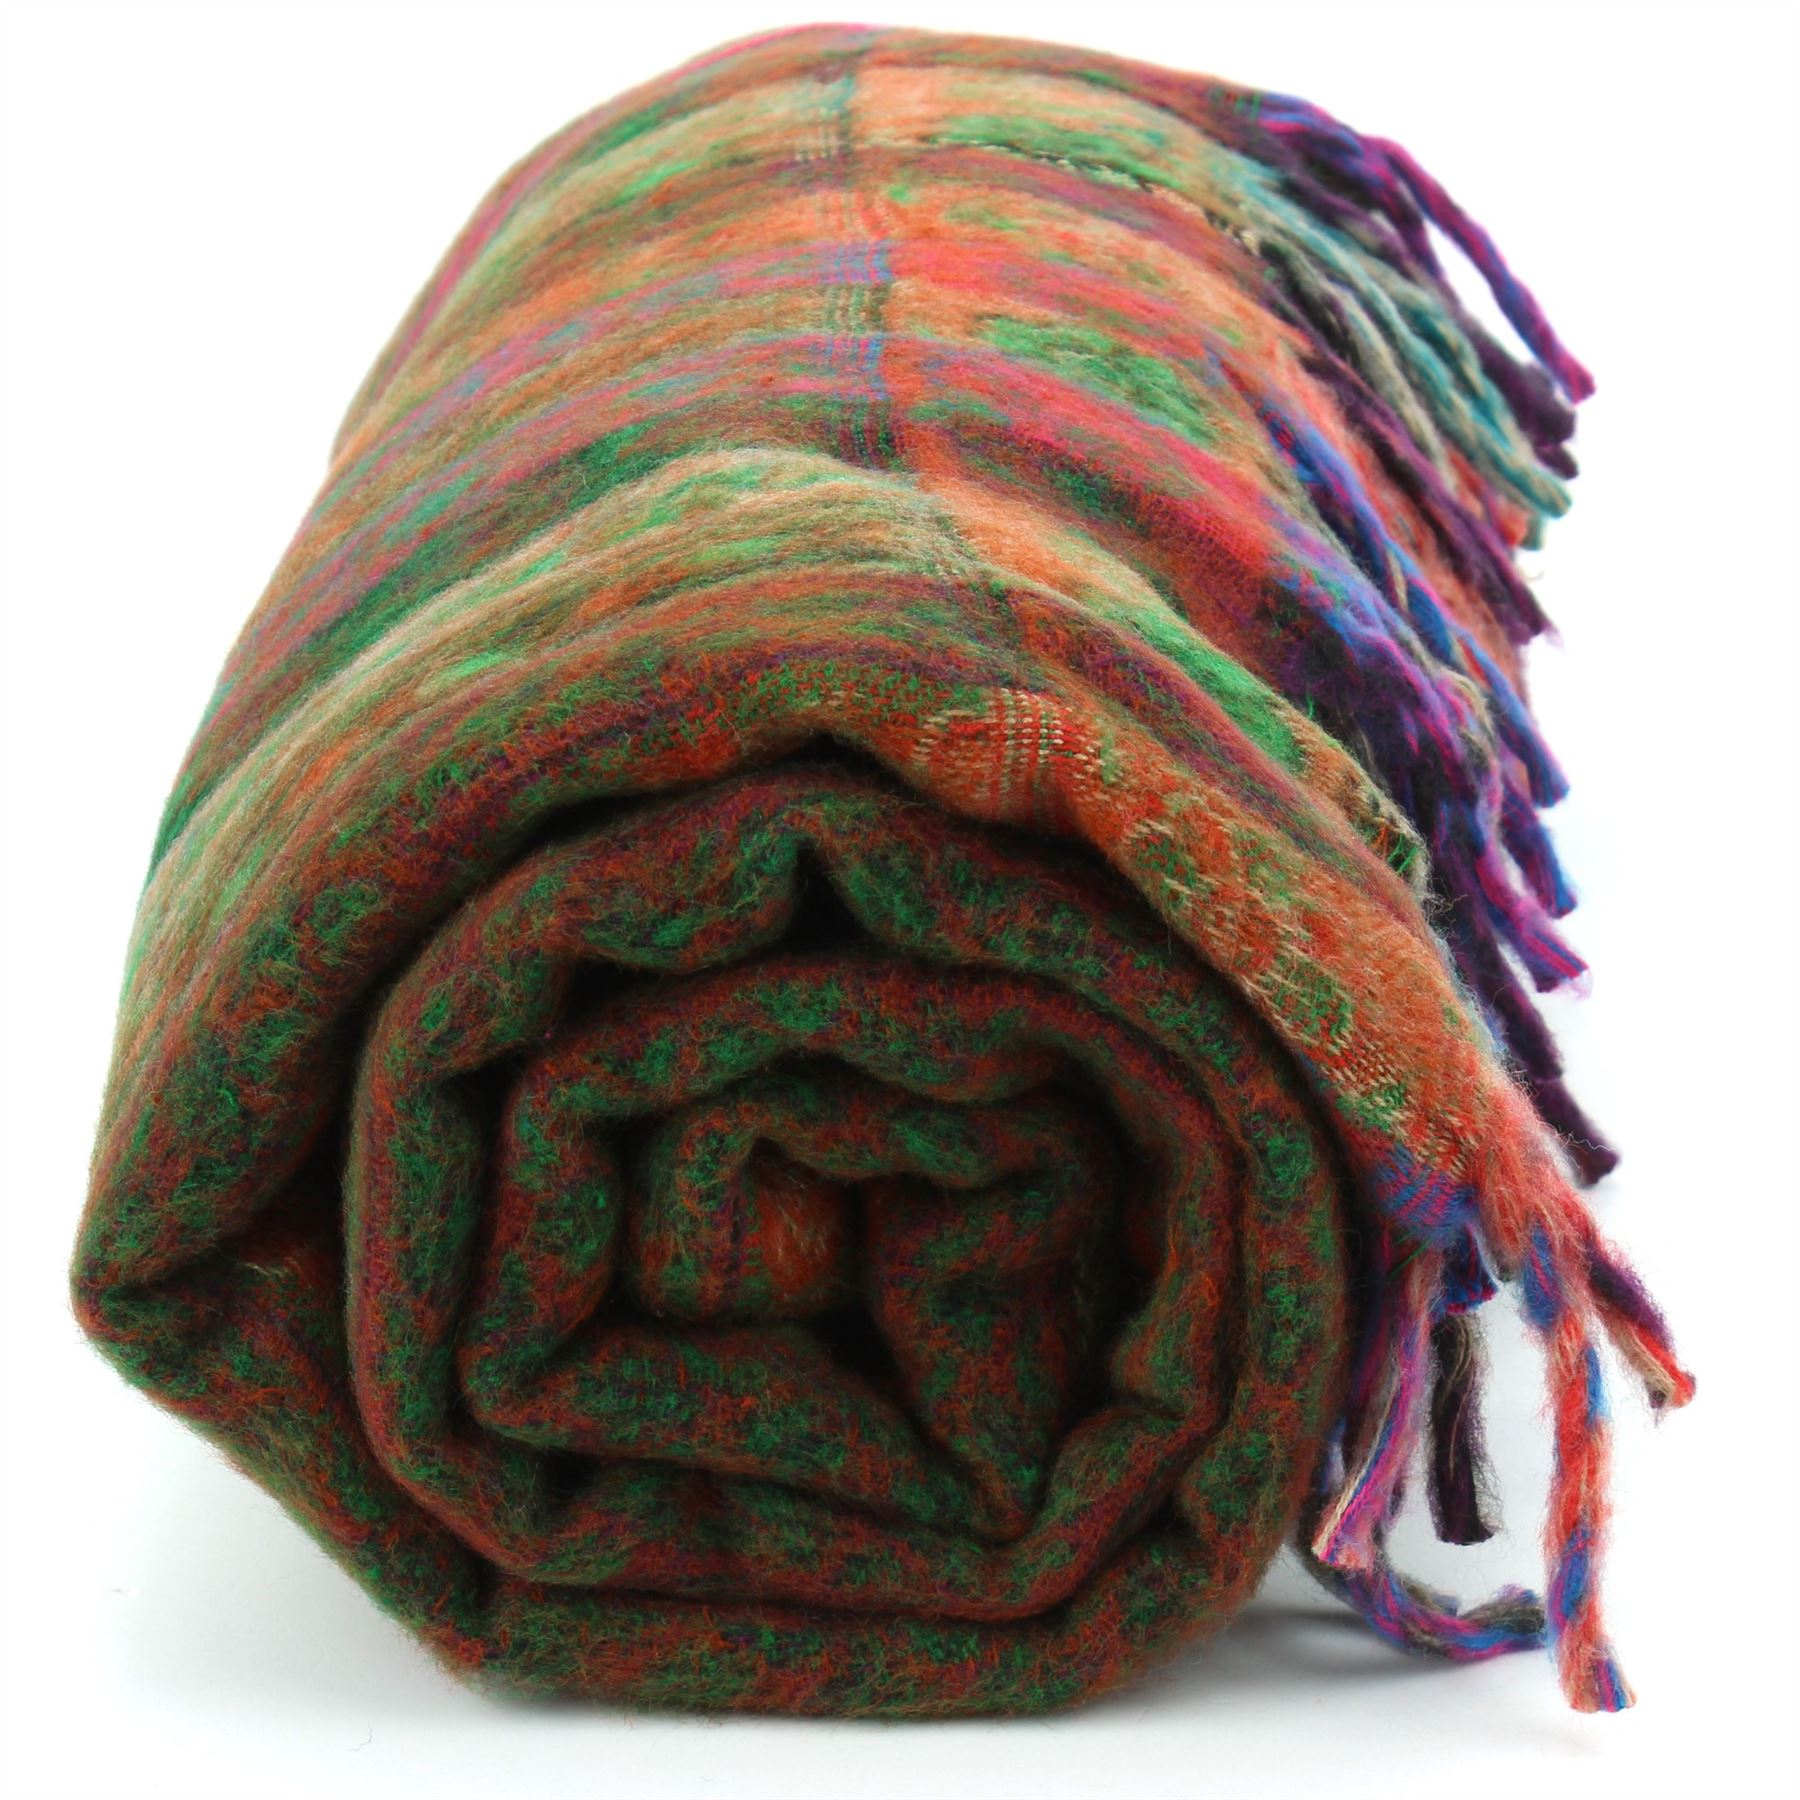 Acrylic-Wool-Blanket-Shawl-Wrap-Throw-Finest-Softest-India-Stripe-Paisley-Travel thumbnail 12